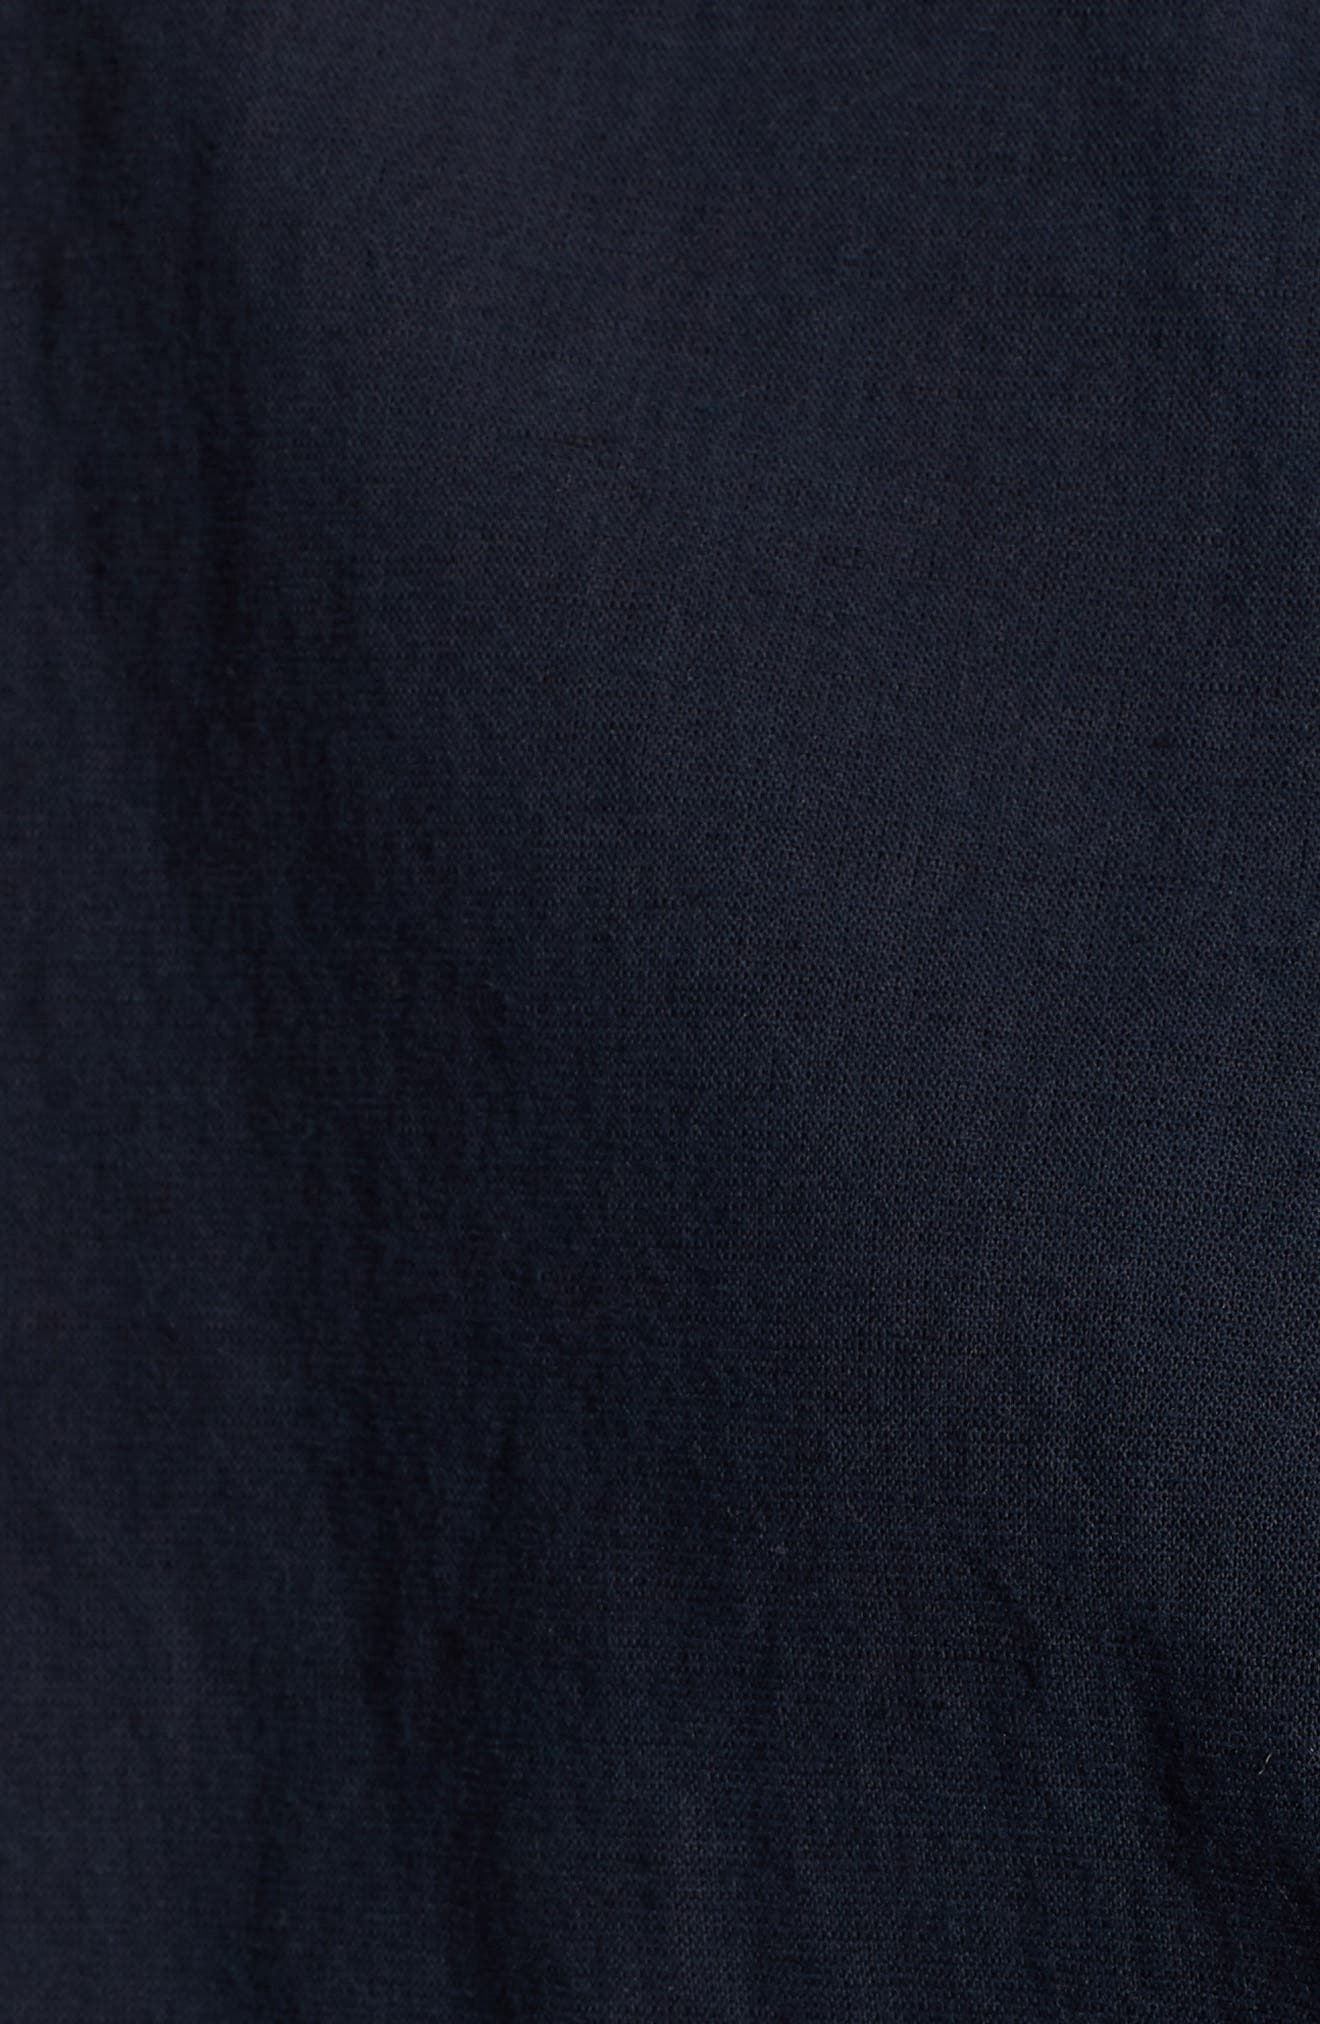 Hadley Shirt,                             Alternate thumbnail 6, color,                             Sulfur Dark Cove